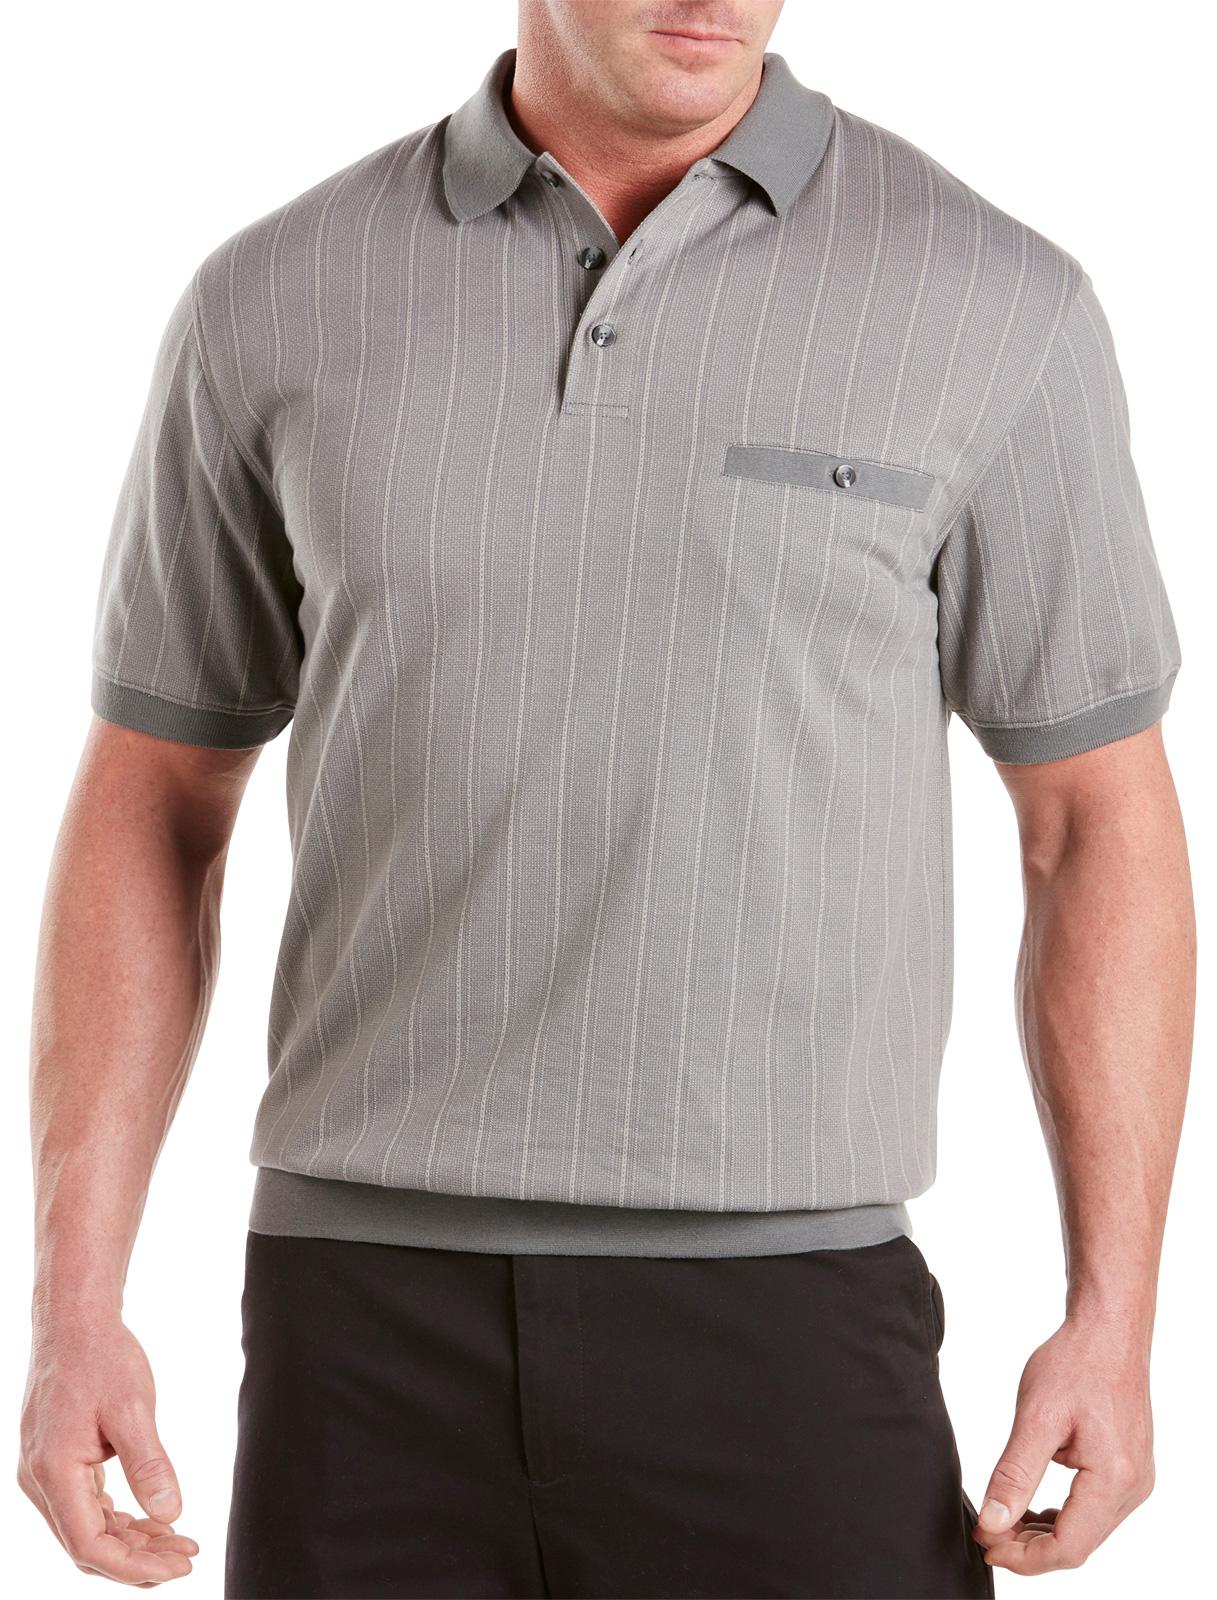 Big and Tall Men's Banded Bottom Shirts